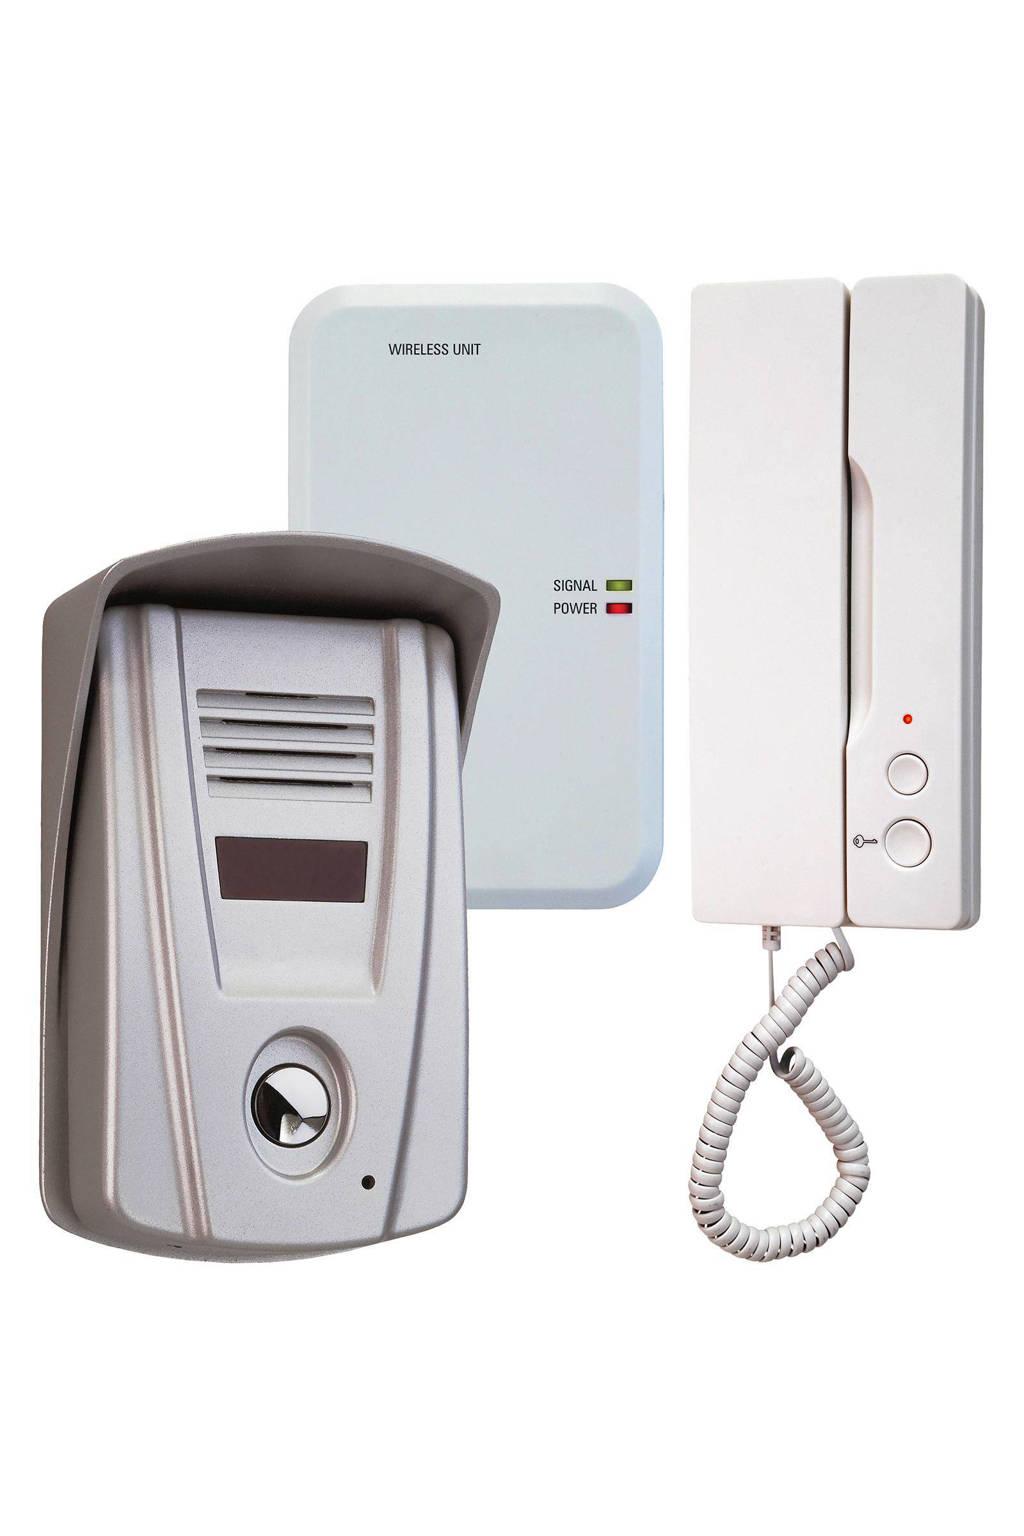 Smartwares IB100 draadloze deurintercom